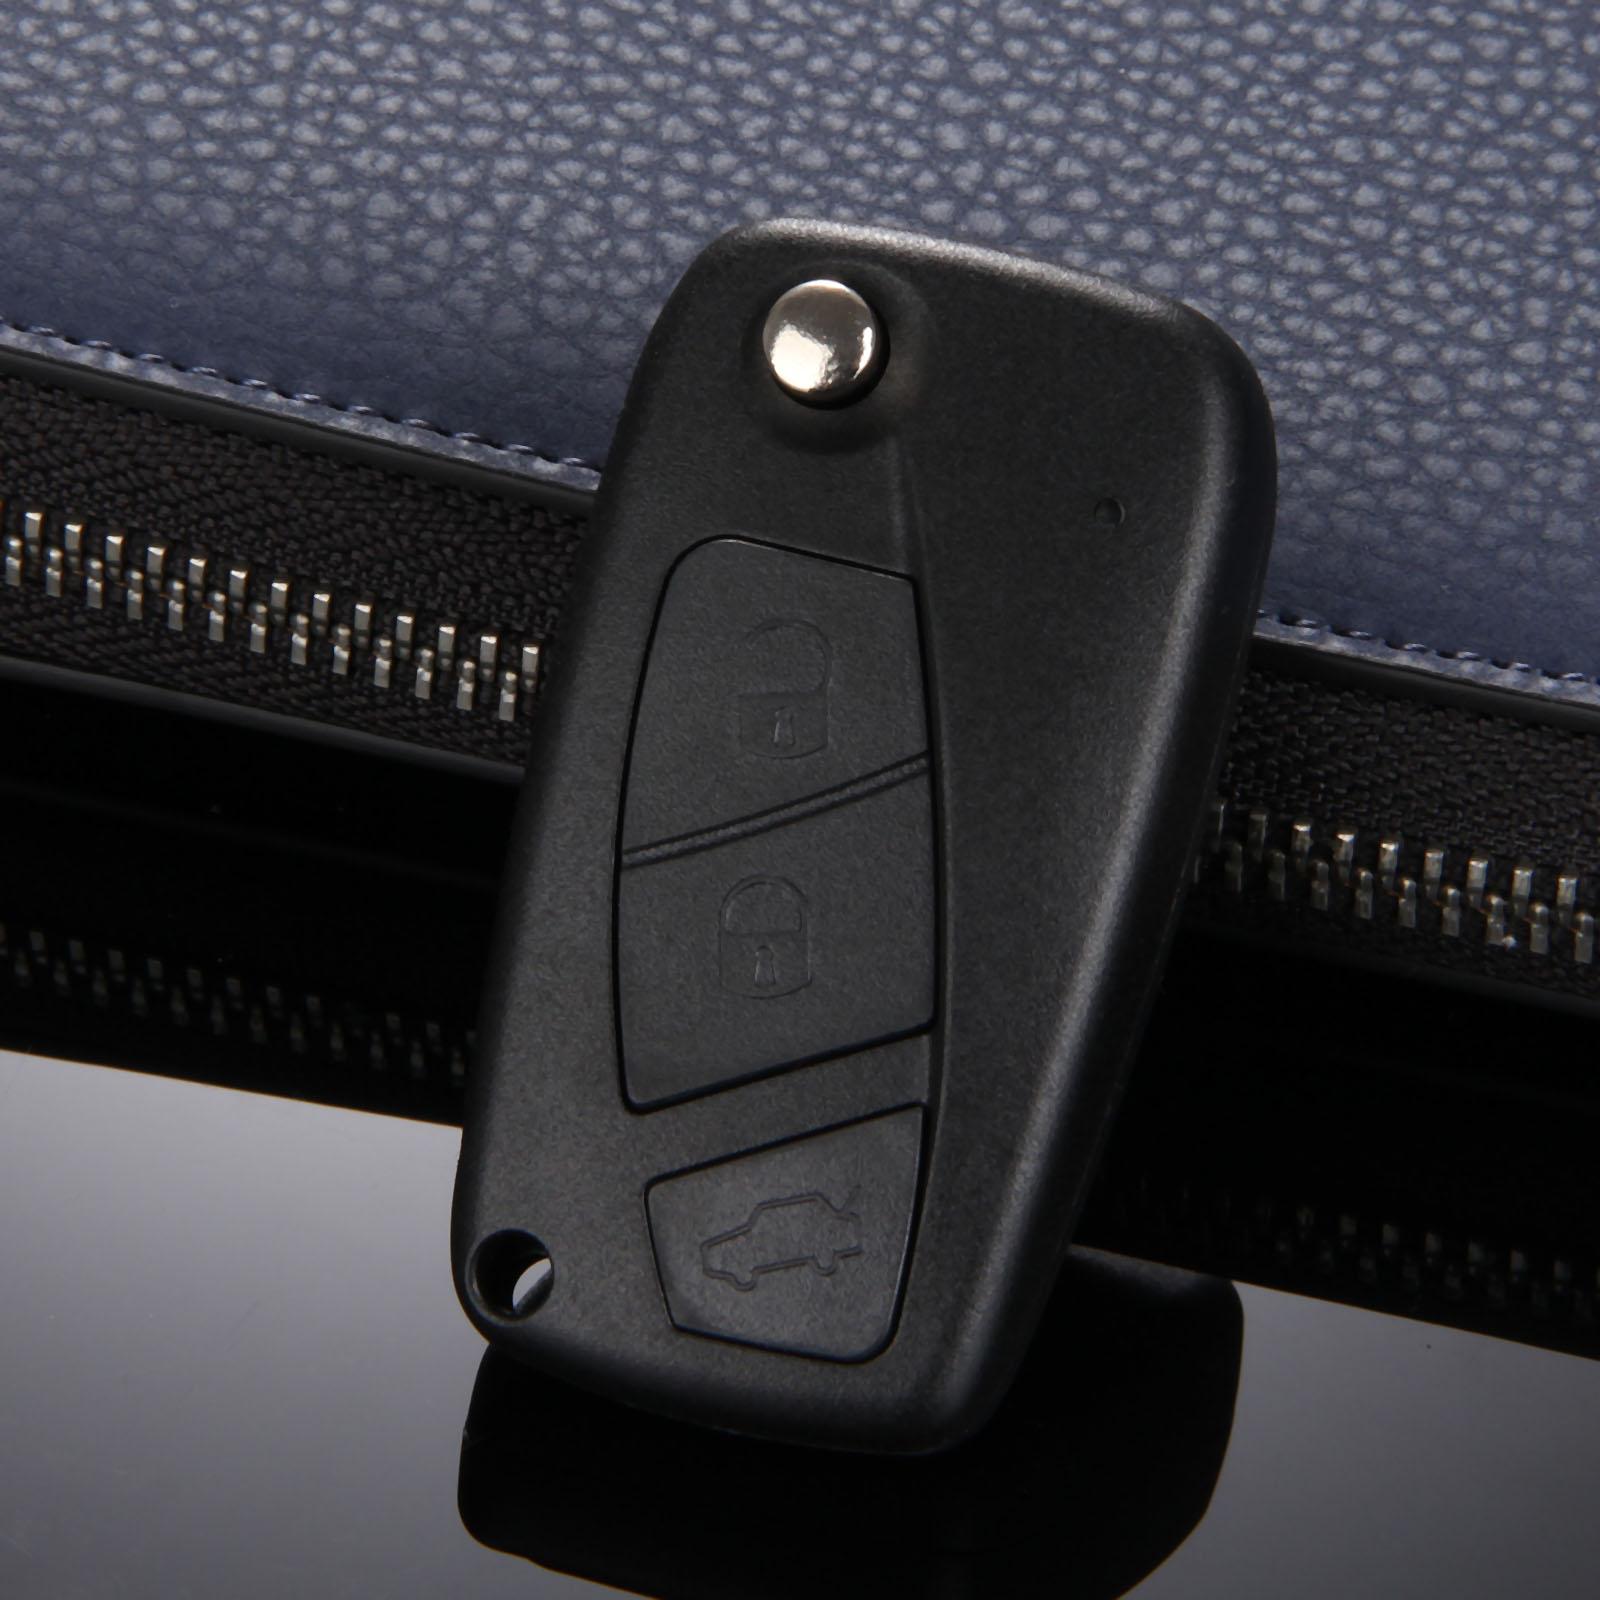 3 Buttons Modified Flip Folding Remote Key Shell Case Cover Fit For Fiat Punto Stilo Idea Ducato Panda Doblo Bravo in Car Key from Automobiles Motorcycles